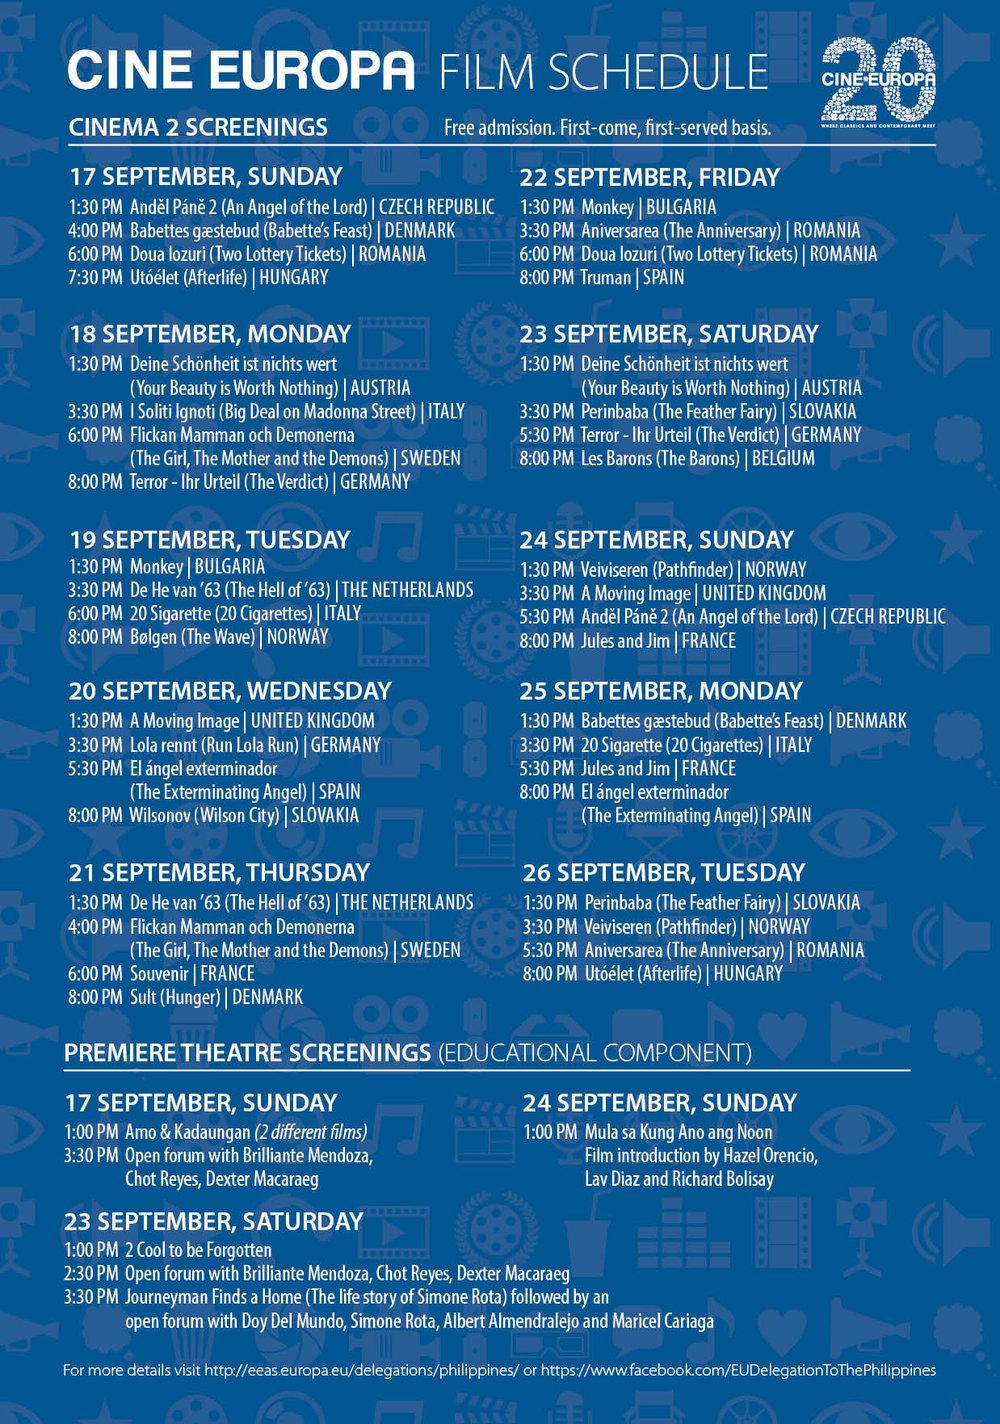 MANILA - POSTCARD_screening schedule.jpg